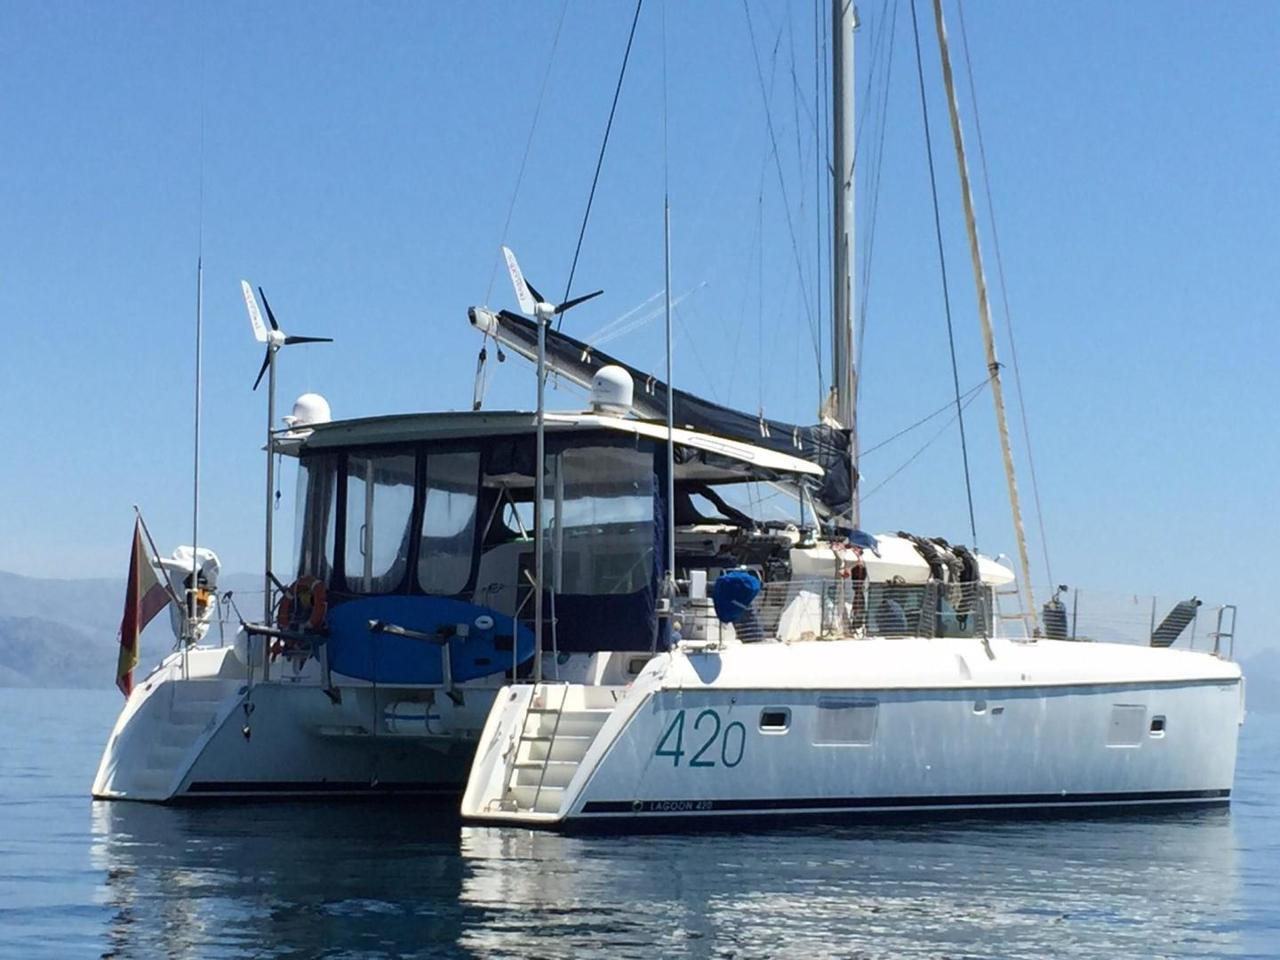 2008 Used Lagoon 420 Catamaran Sailboat For Sale - $390,000 - St